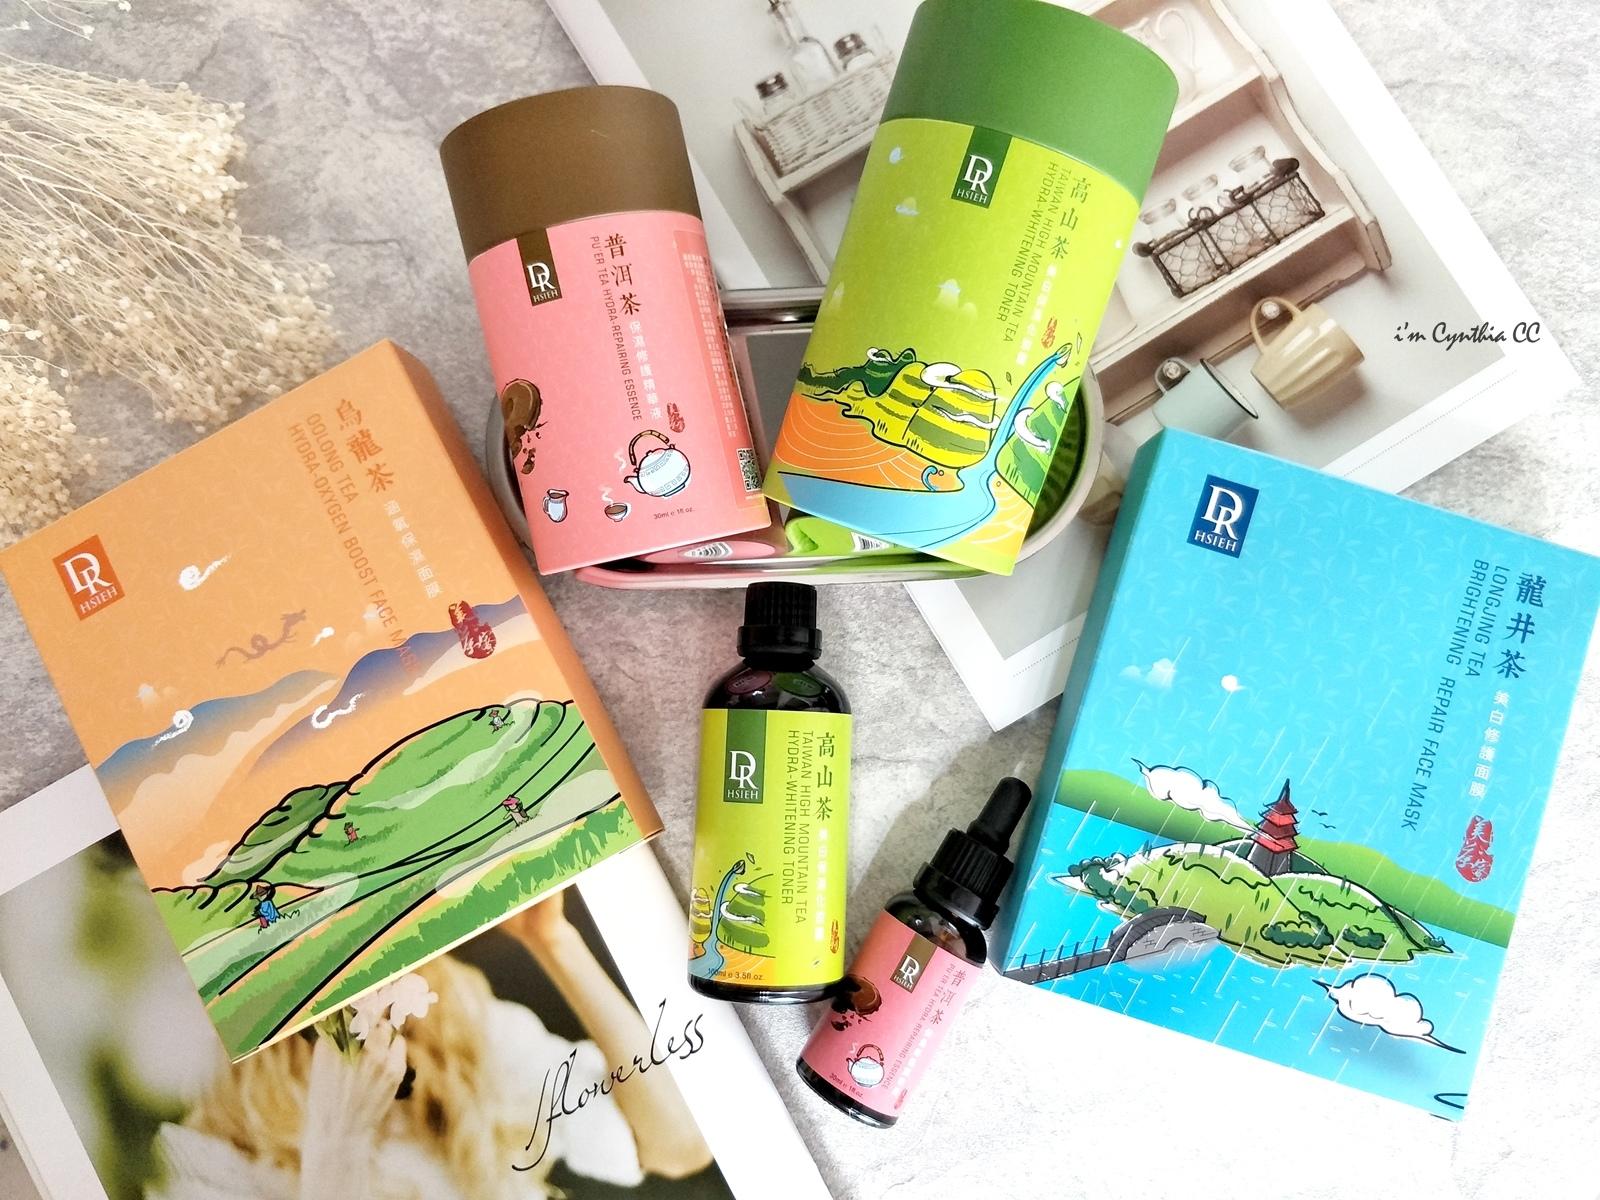 Dr.Hsieh達特醫美茶系列開箱 高山茶美白保濕化妝露、普洱茶保濕修護精華液、龍井茶美白修護面膜和烏龍茶涵氧保濕面膜